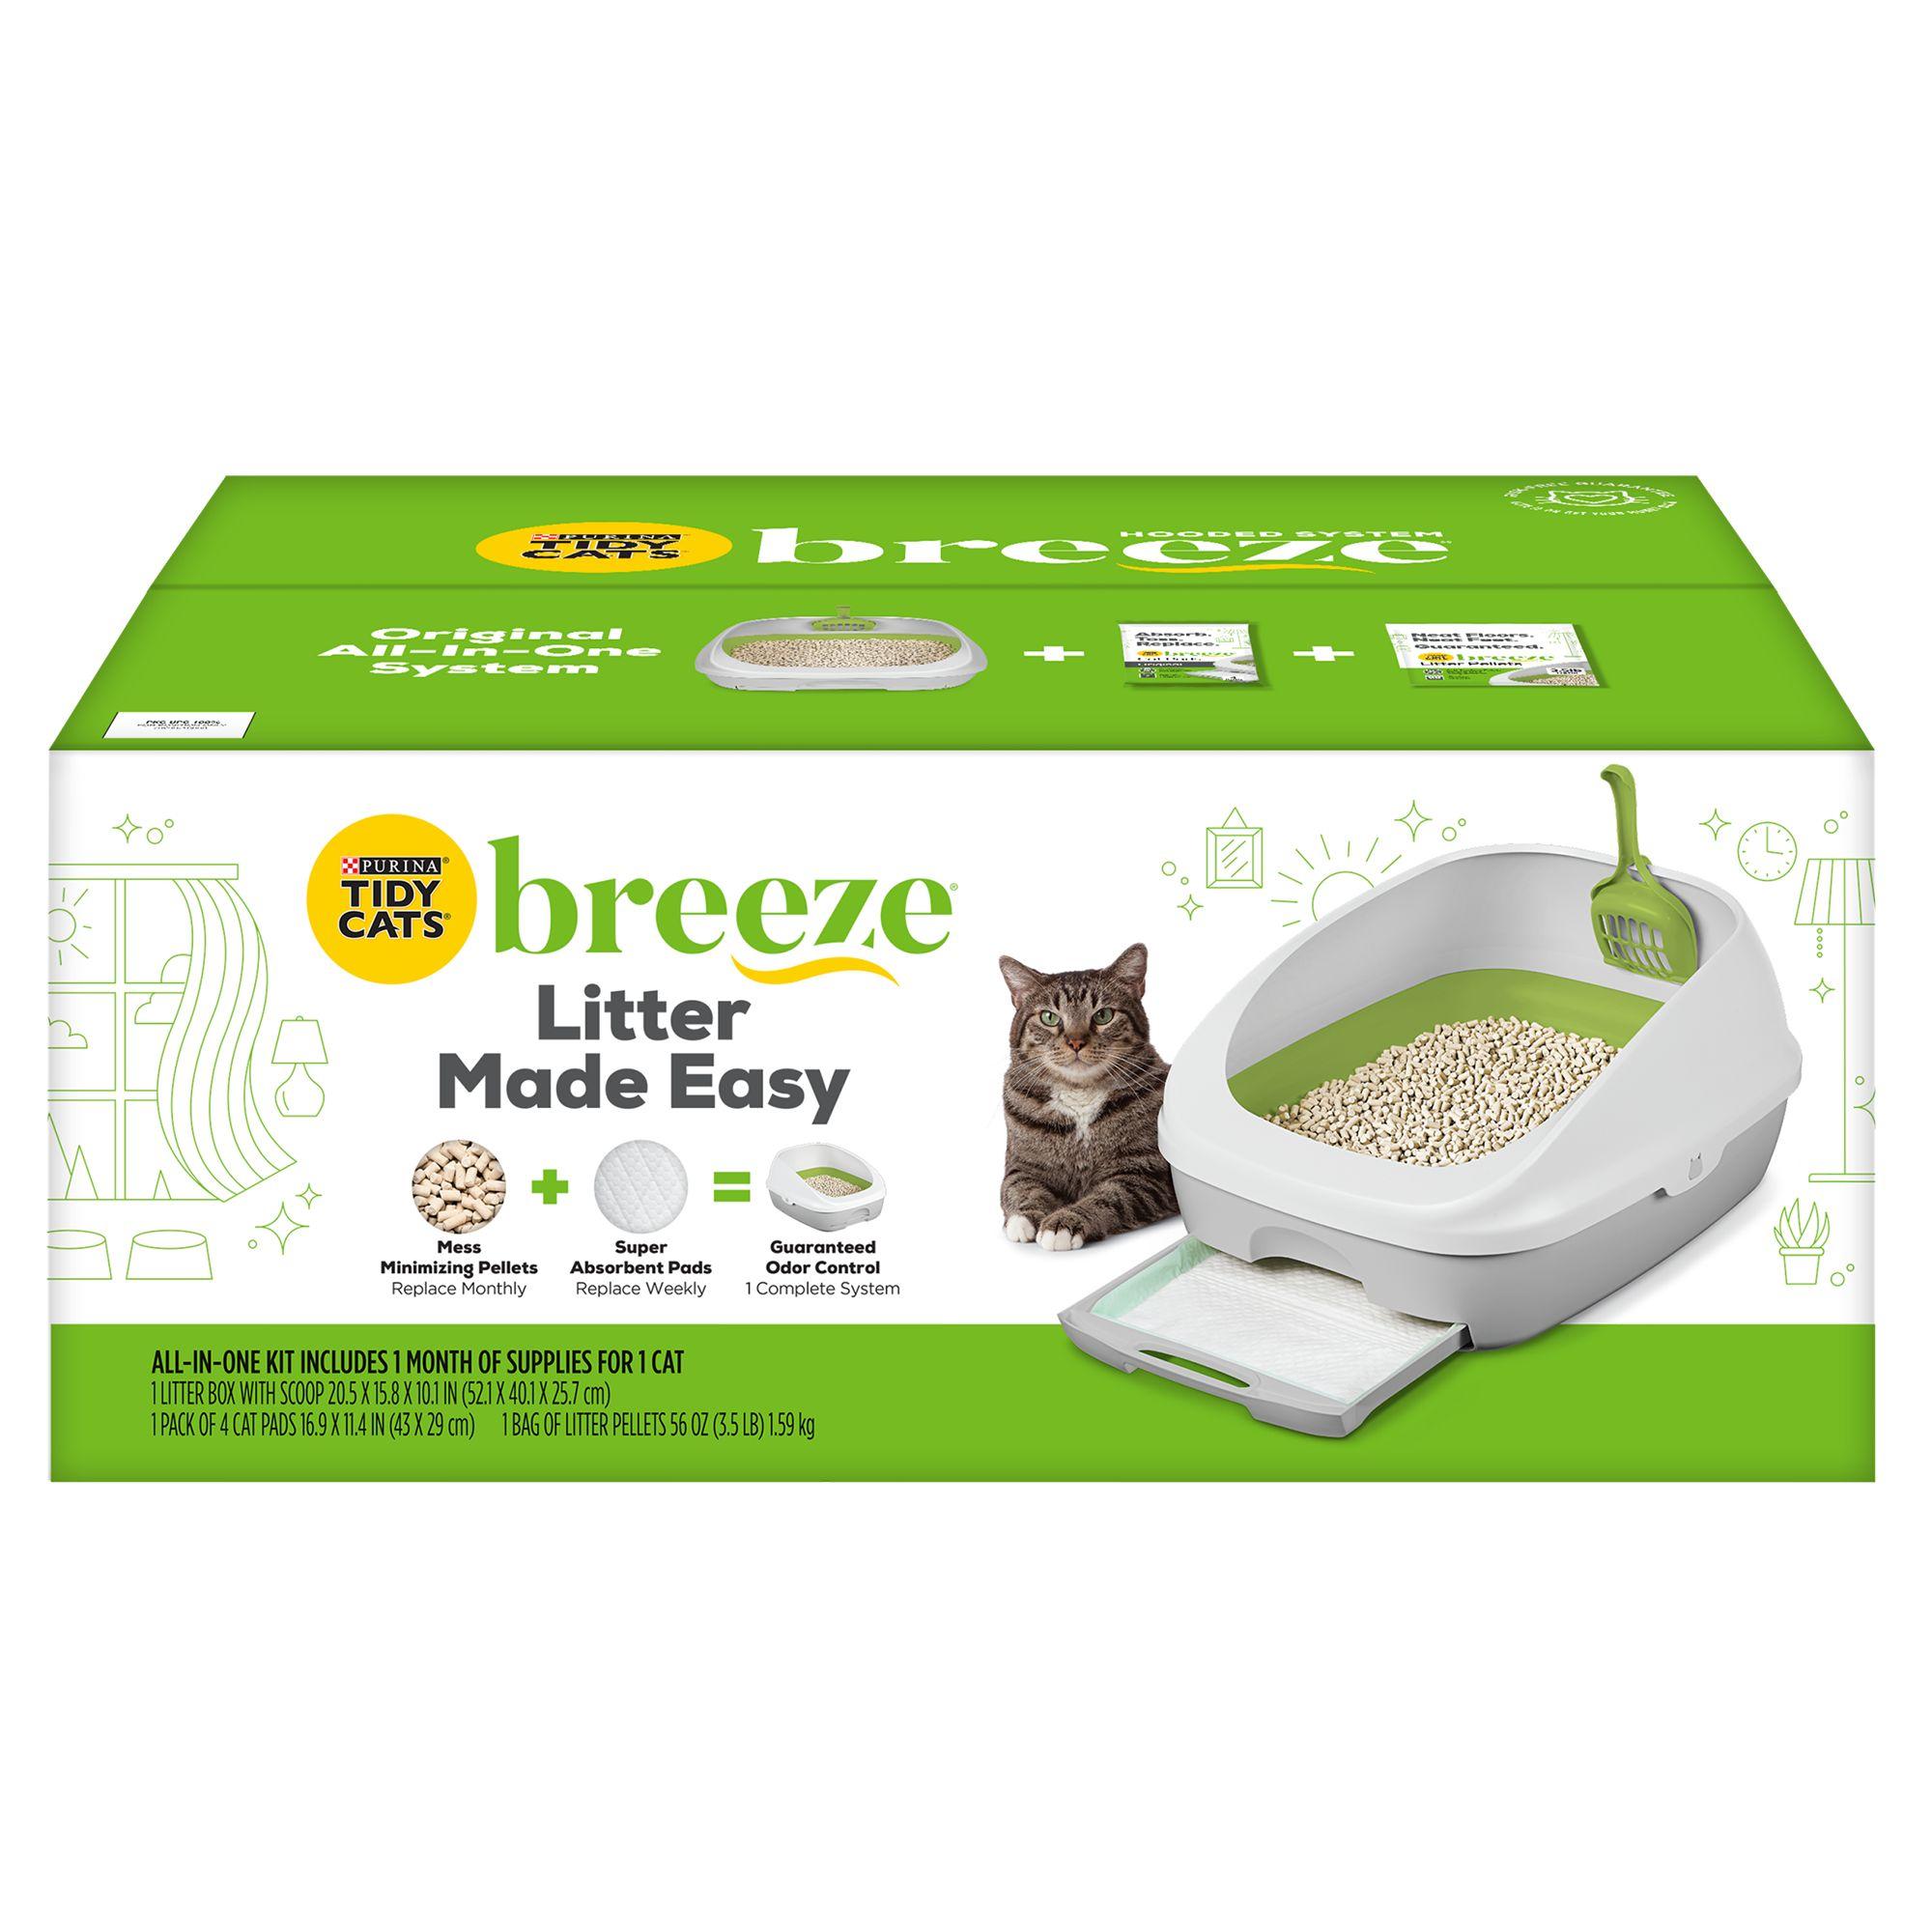 Purina Tidy Cats Breeze Cat Litter Box System Size 20.3l X 15.2w X 11.8h White Green